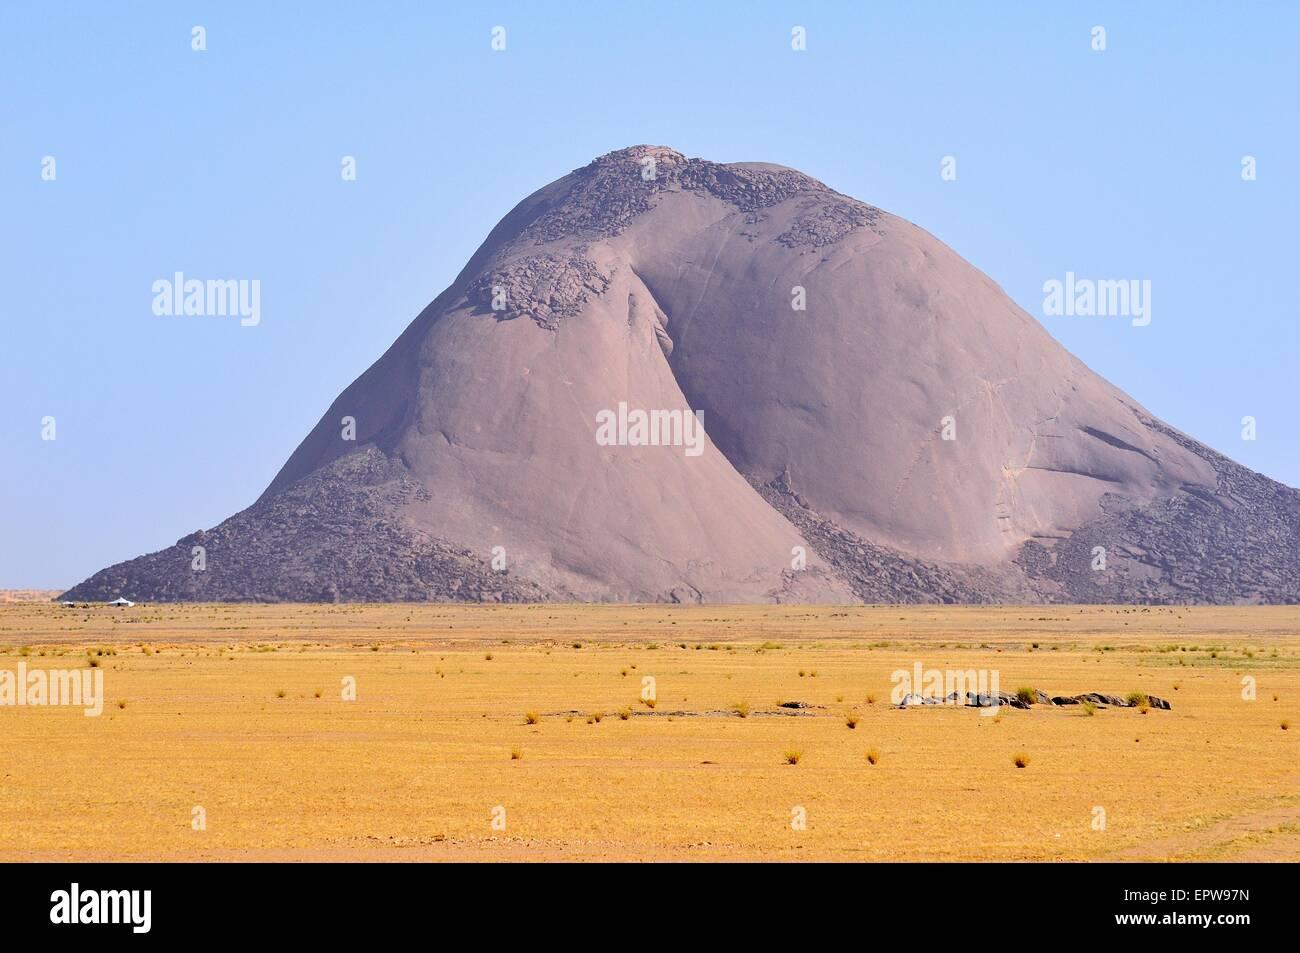 Aicha monolith in the flat desert, Adrar region, Mauritania - Stock Image